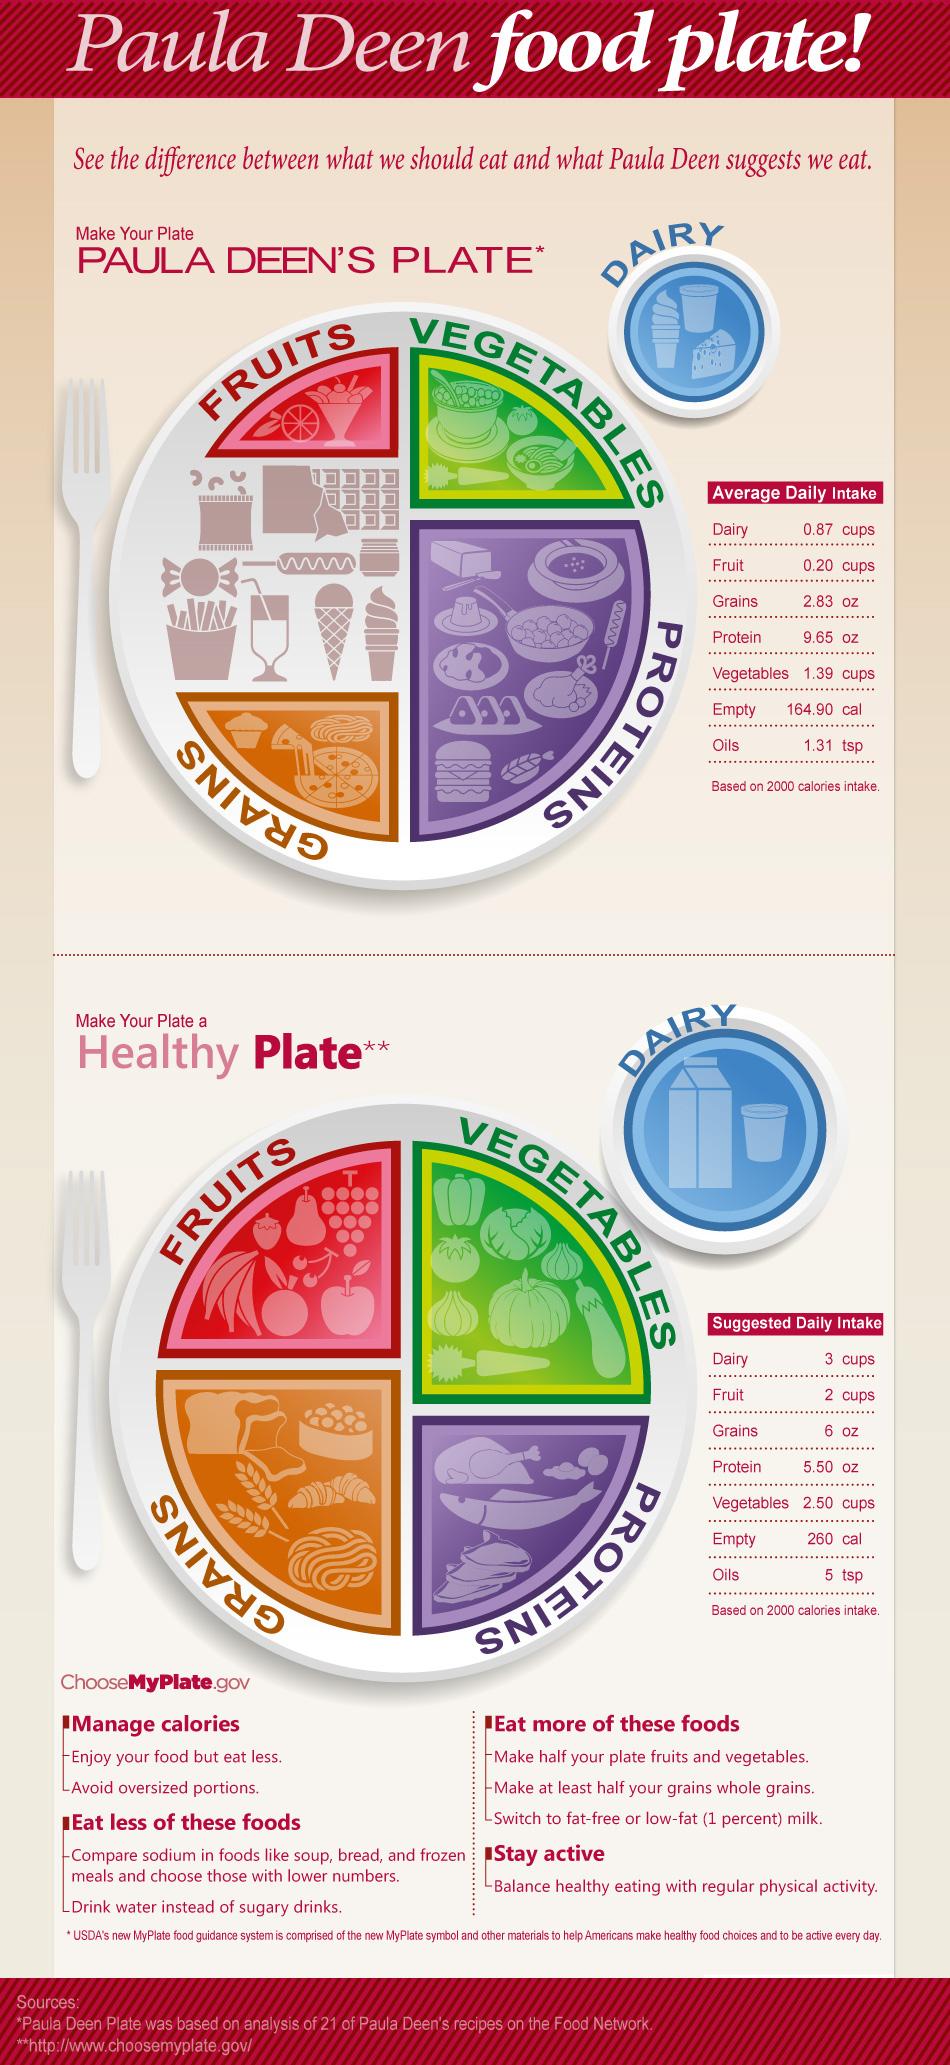 Paula Deen food plate